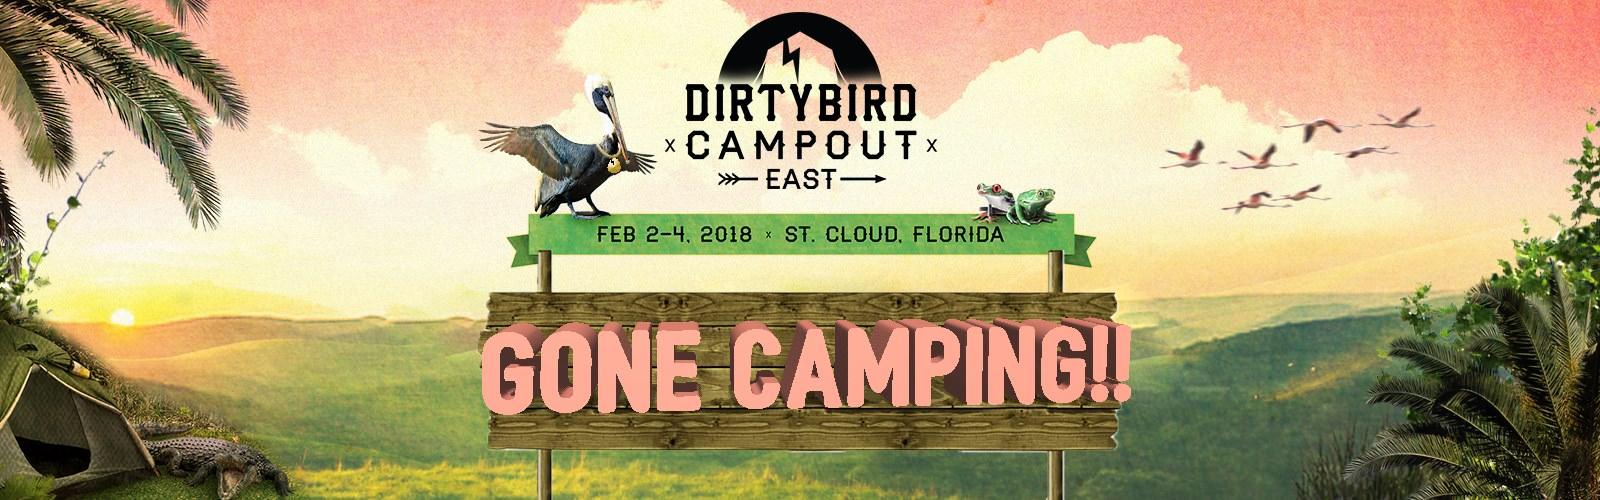 Dirtybird Campout East